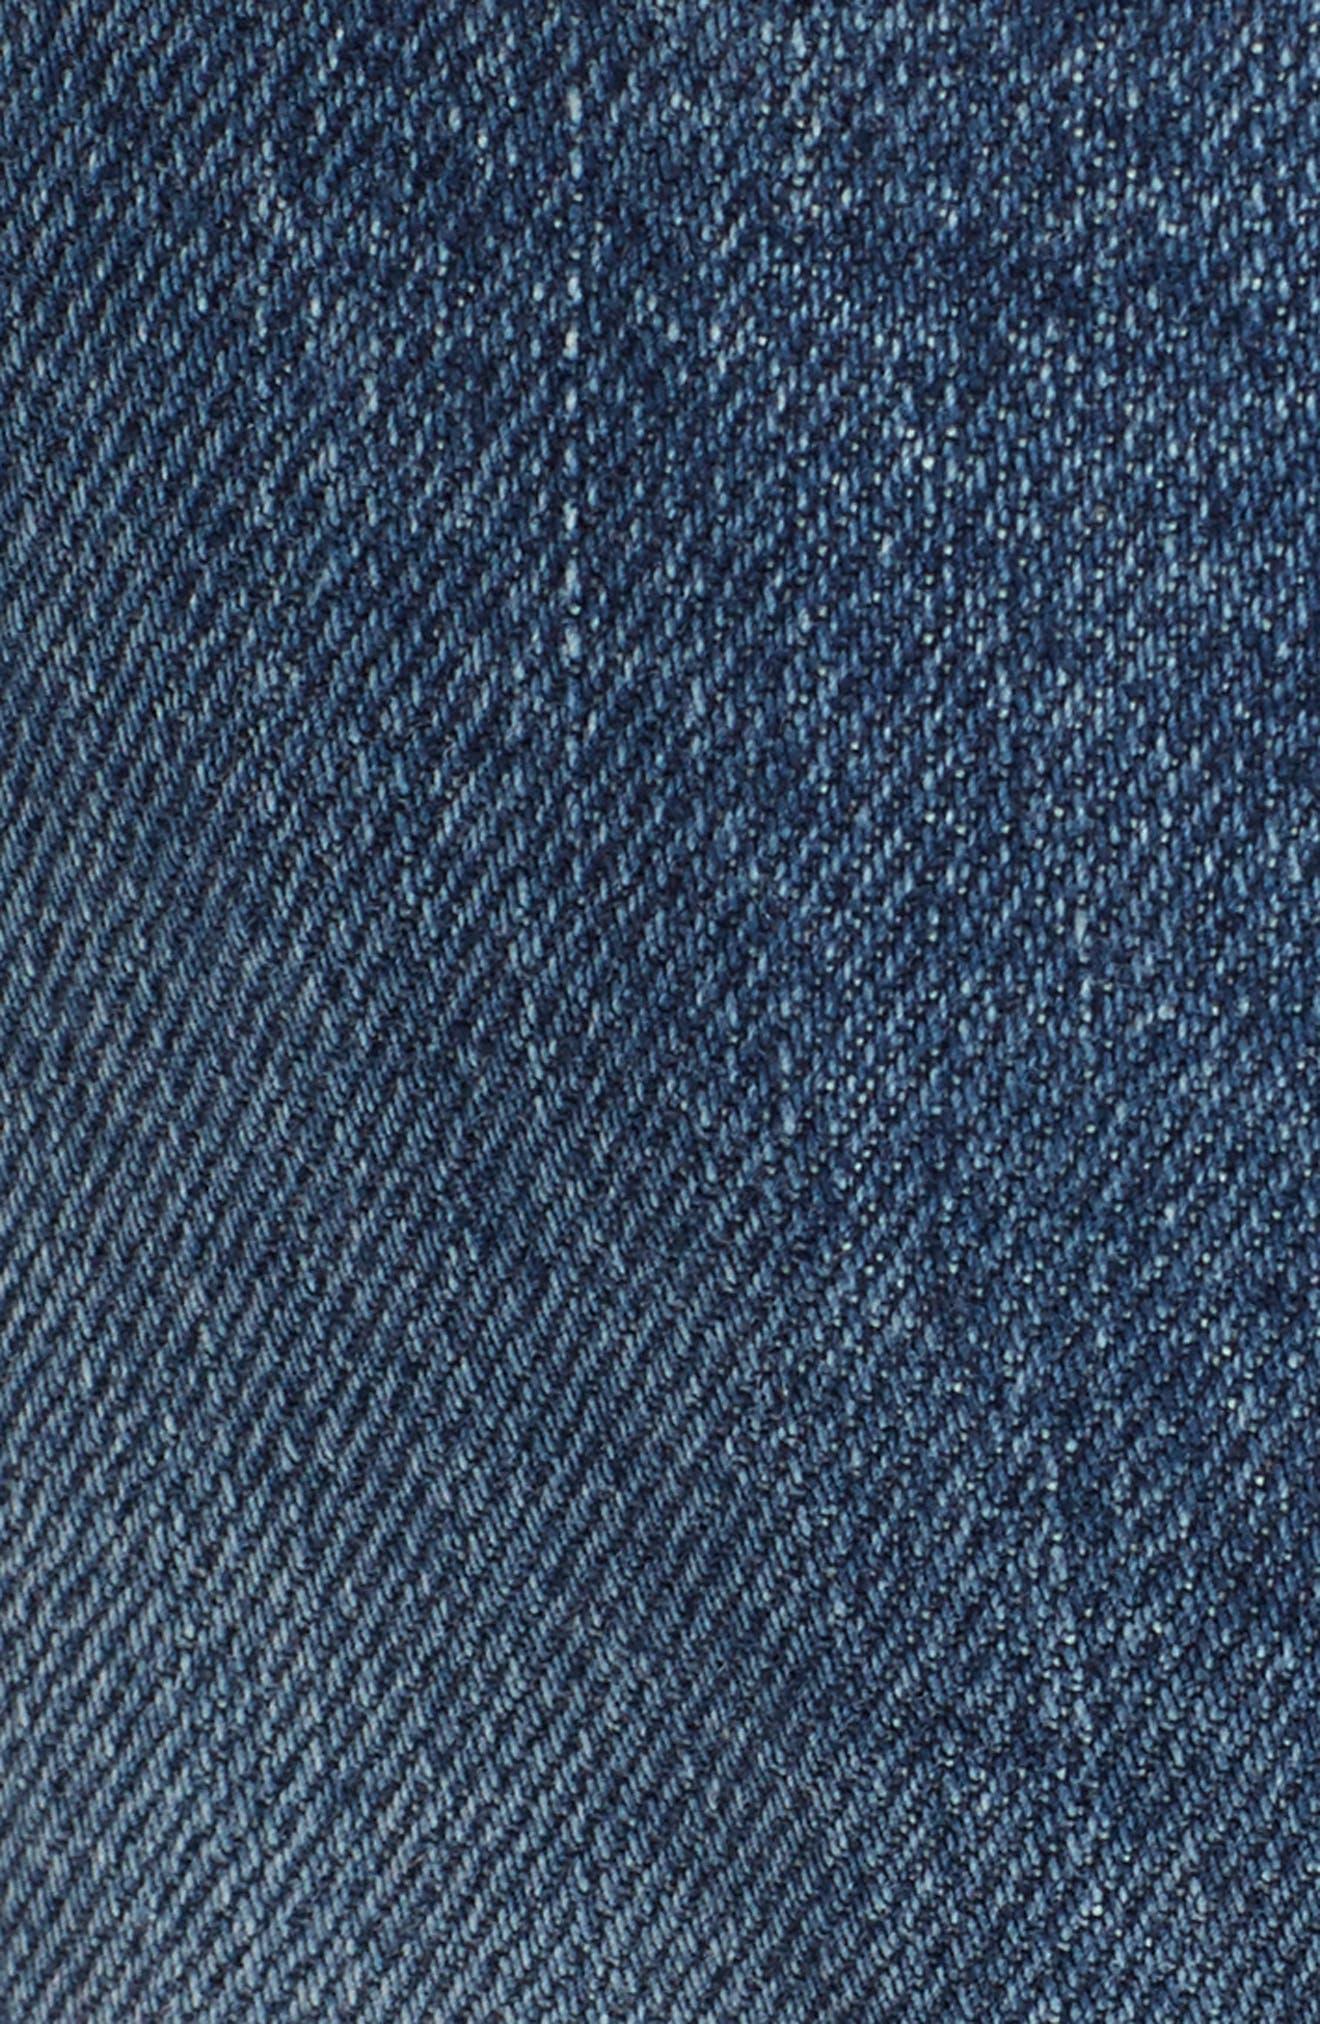 Alternate Image 3  - Dolce&Gabbana Ripped Skinny Jeans